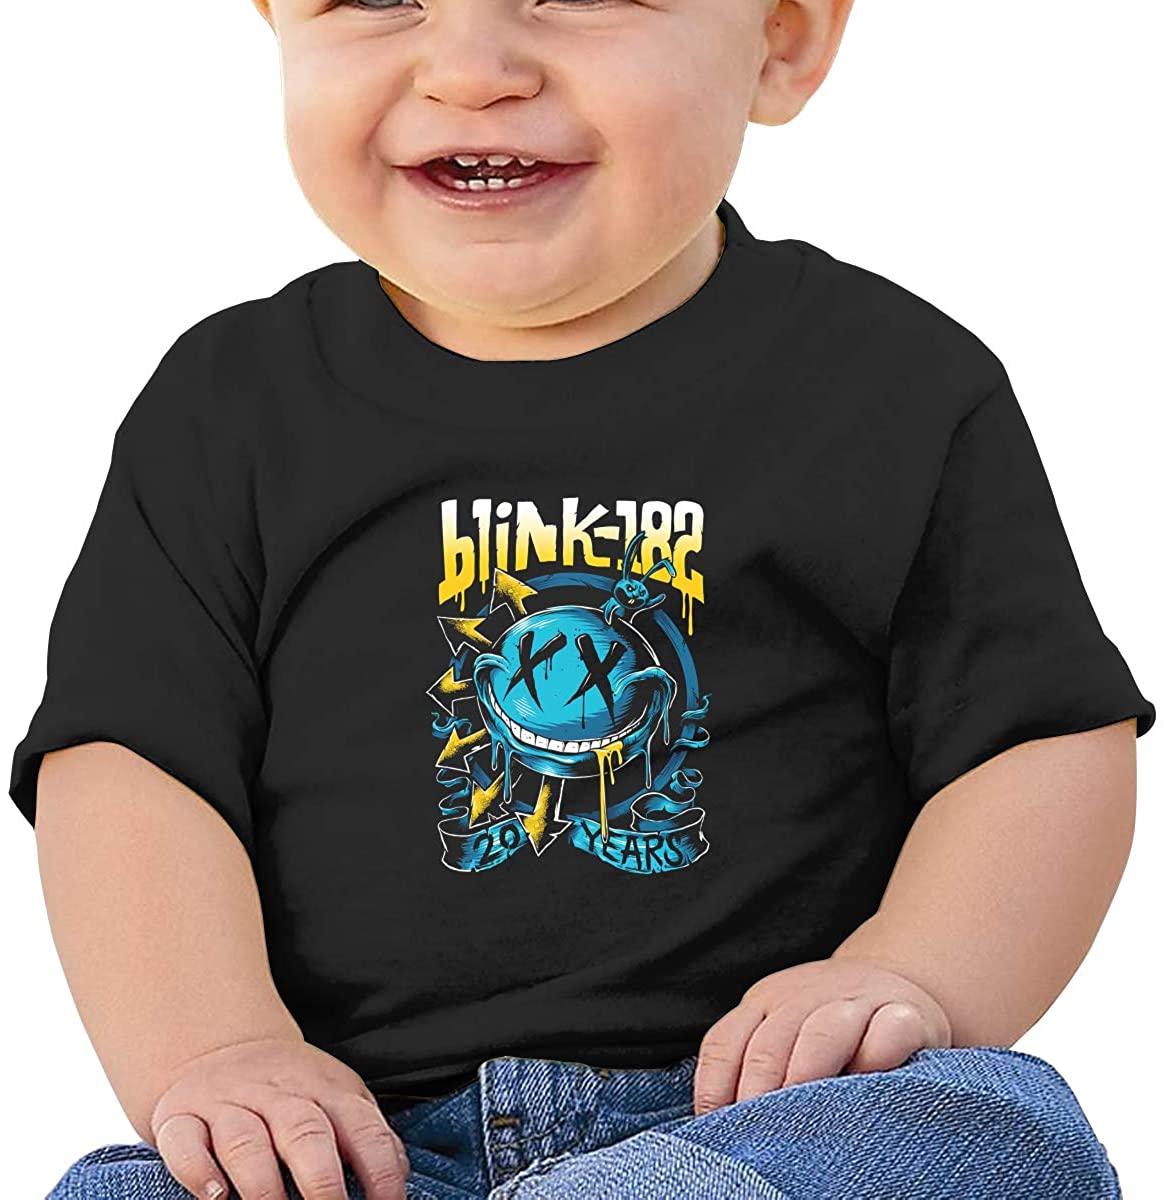 Hangquq Unisex Baby Blink 182 Round Neck Shirt Short Sleeve T-Shirt.